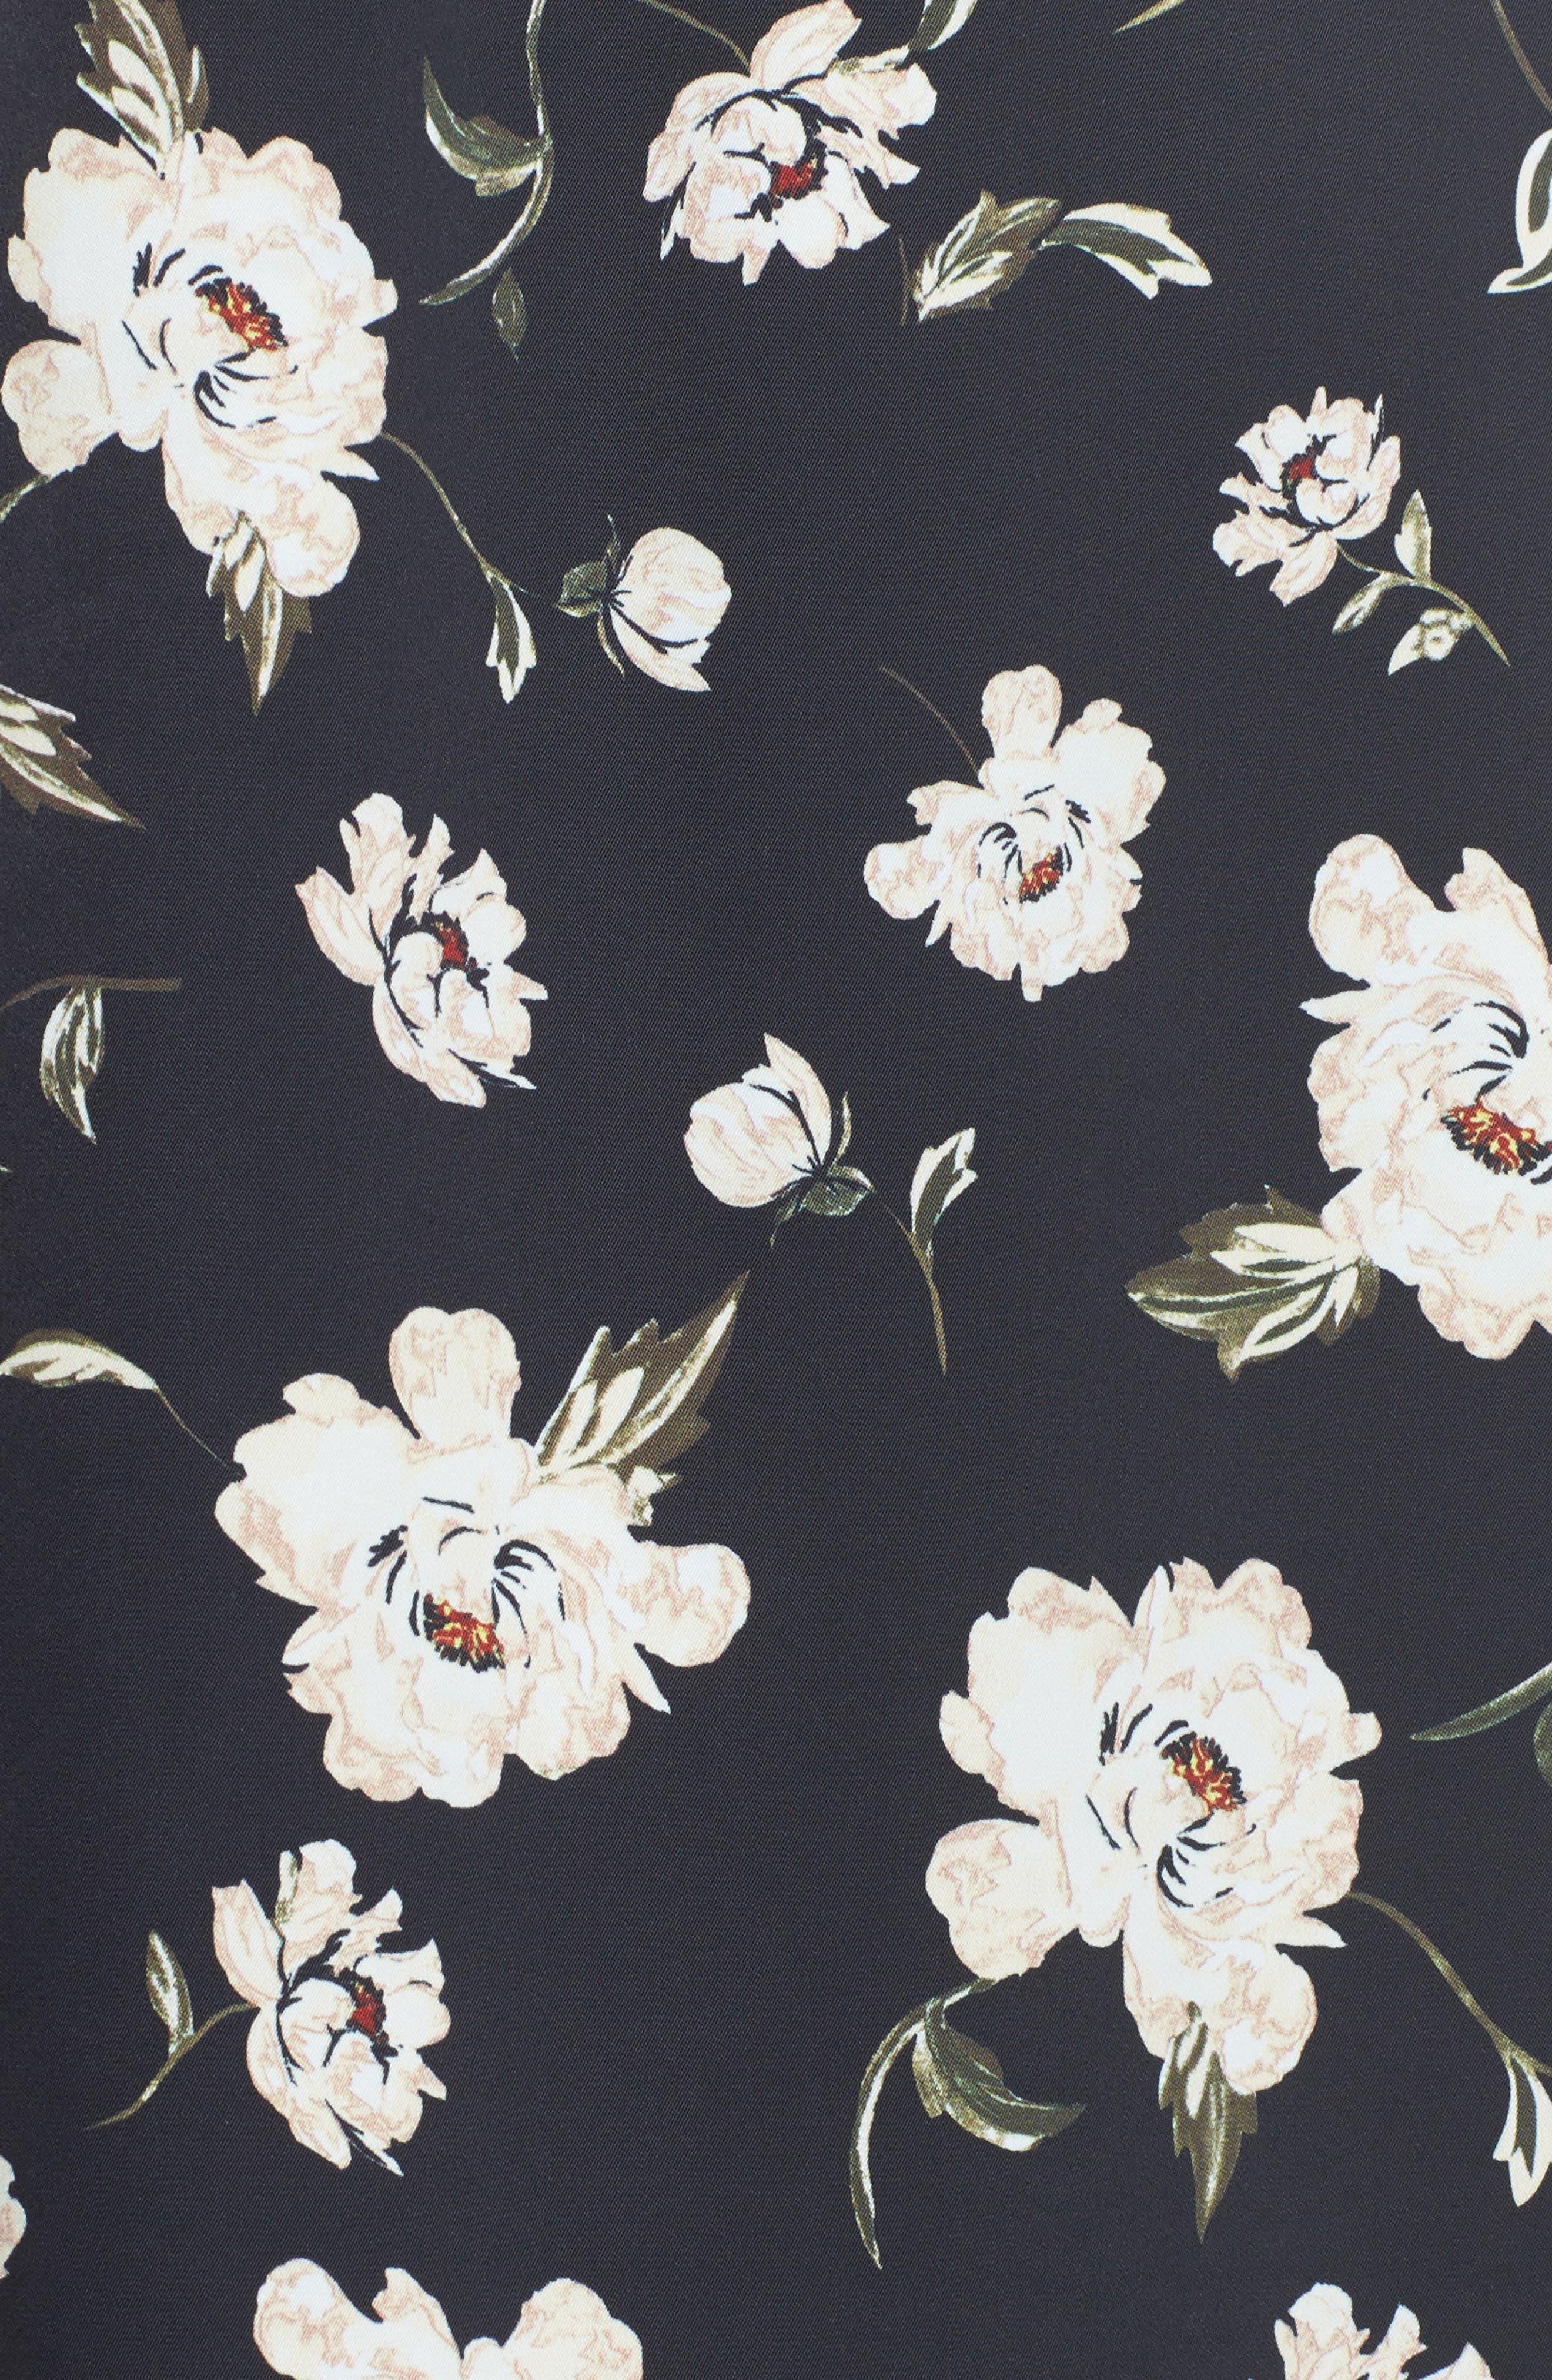 L'Academie The Shirt Dress Midi Dress,                             Alternate thumbnail 5, color,                             001